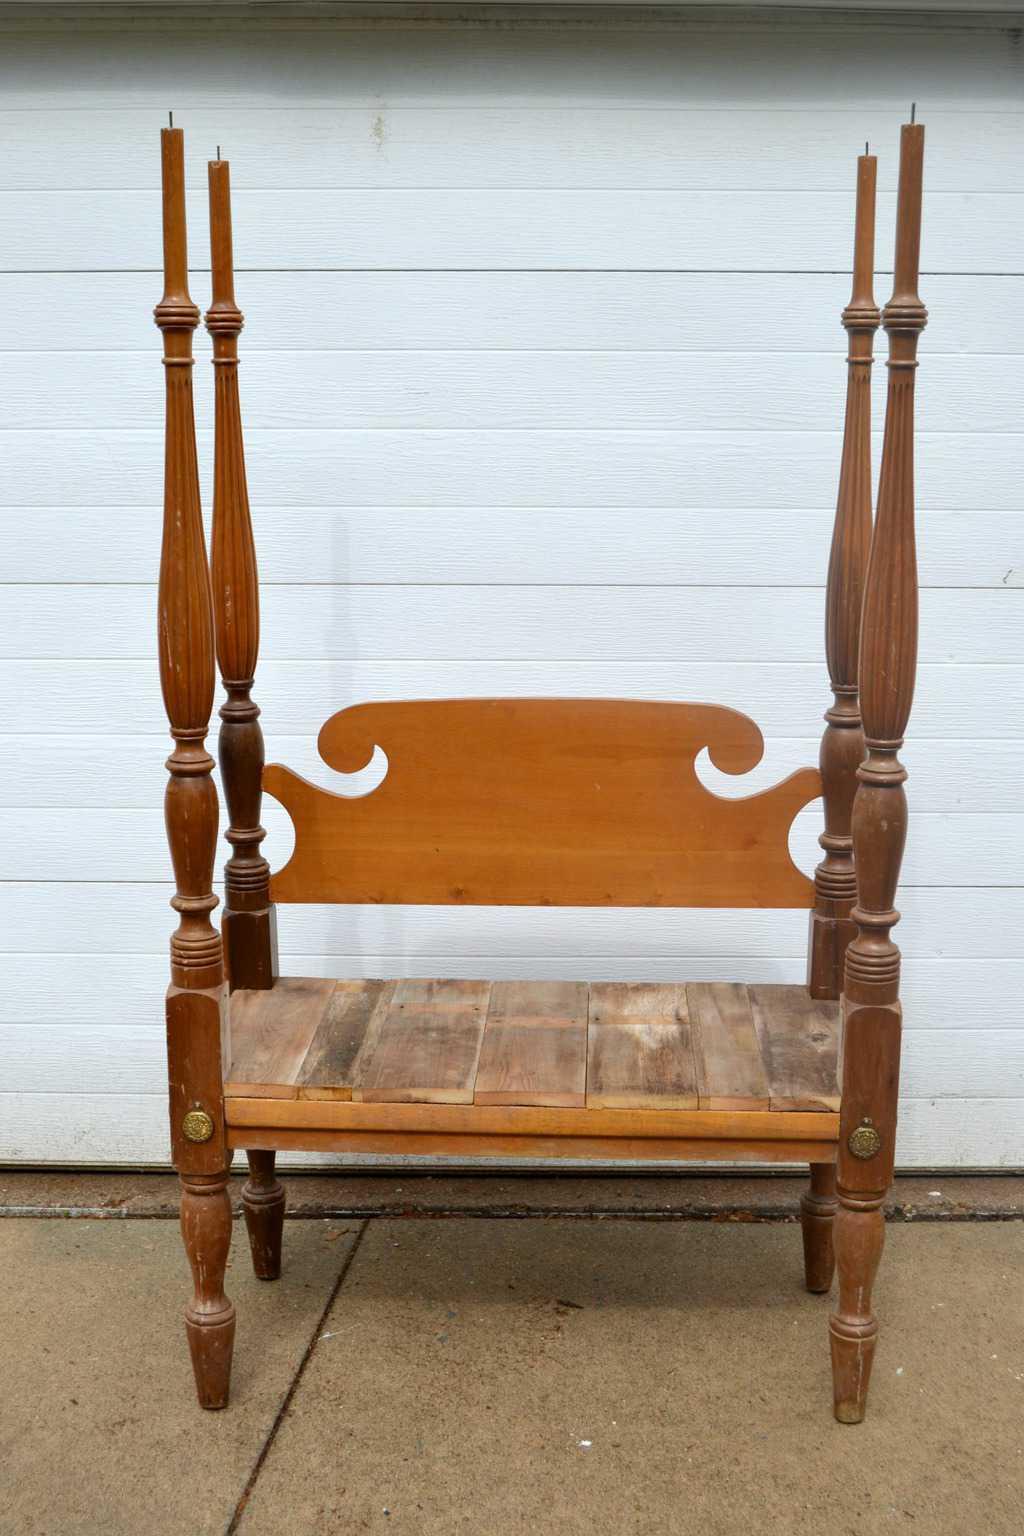 Diy Bedroom Bench diy bed frame bench - my creative days